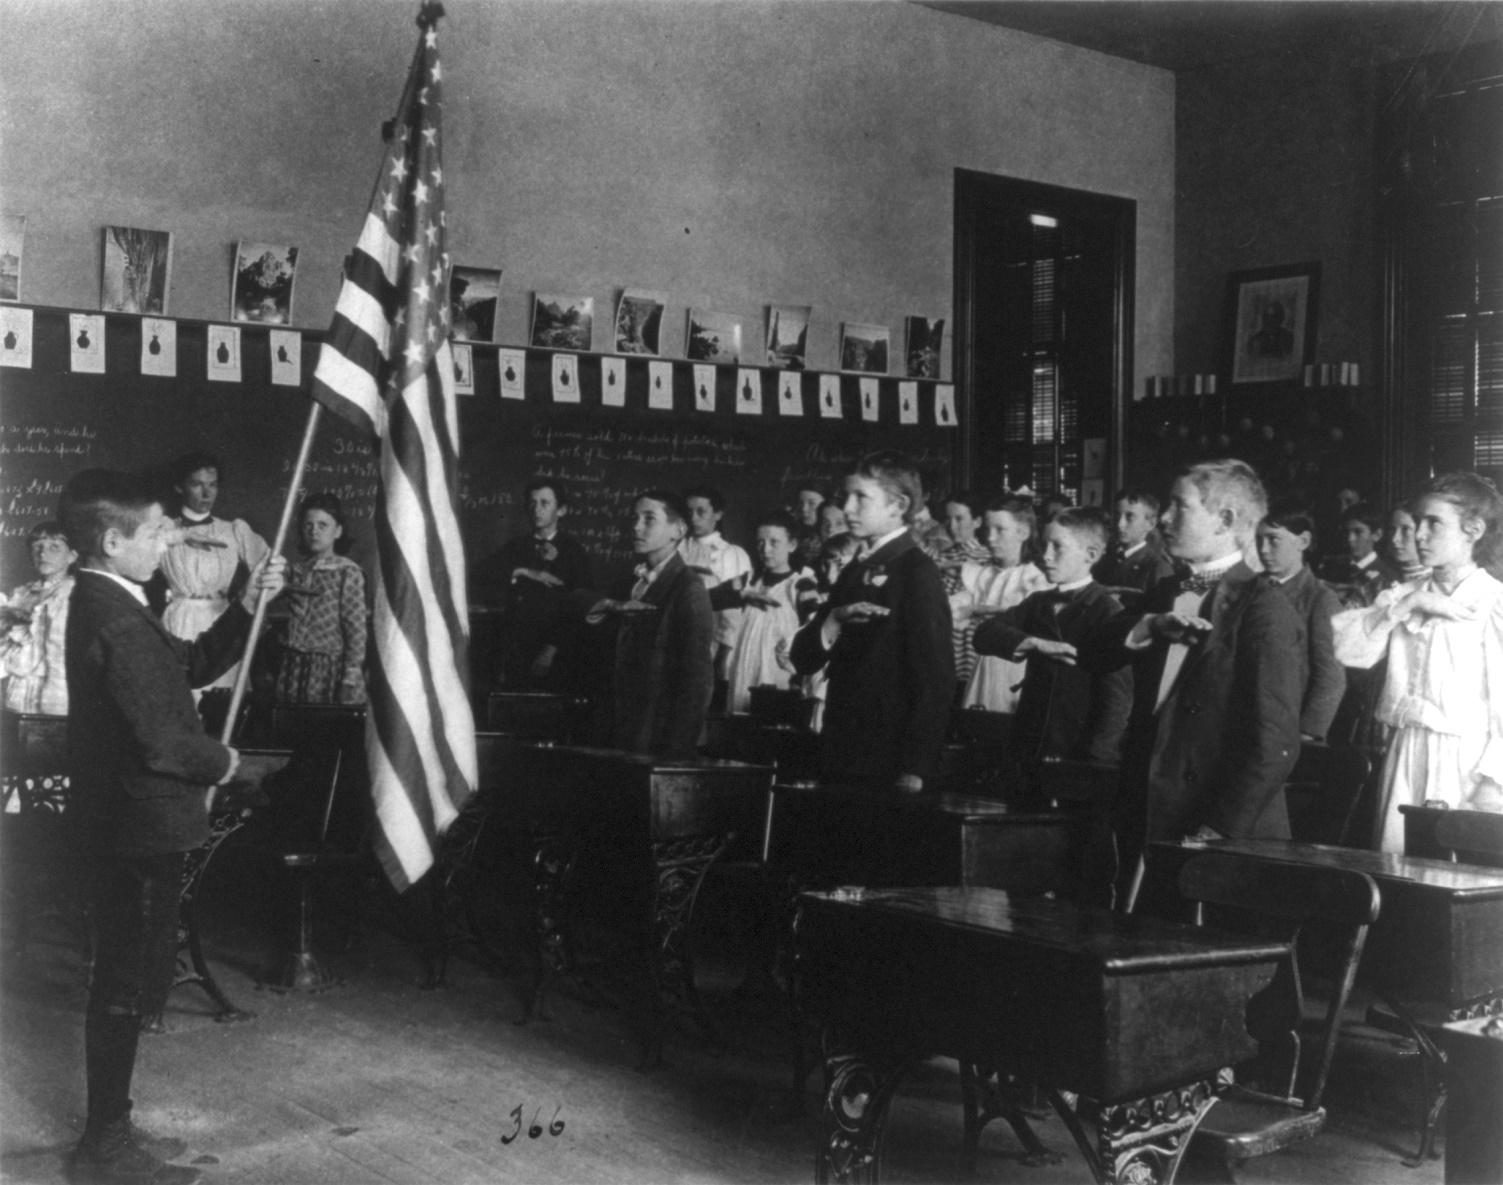 Students pledging to the flag, 1899, 8th Division, Washington, D.C. Part of the Frances Benjamin Johnston 1890 - 1900 Washington, D.C., school survey.